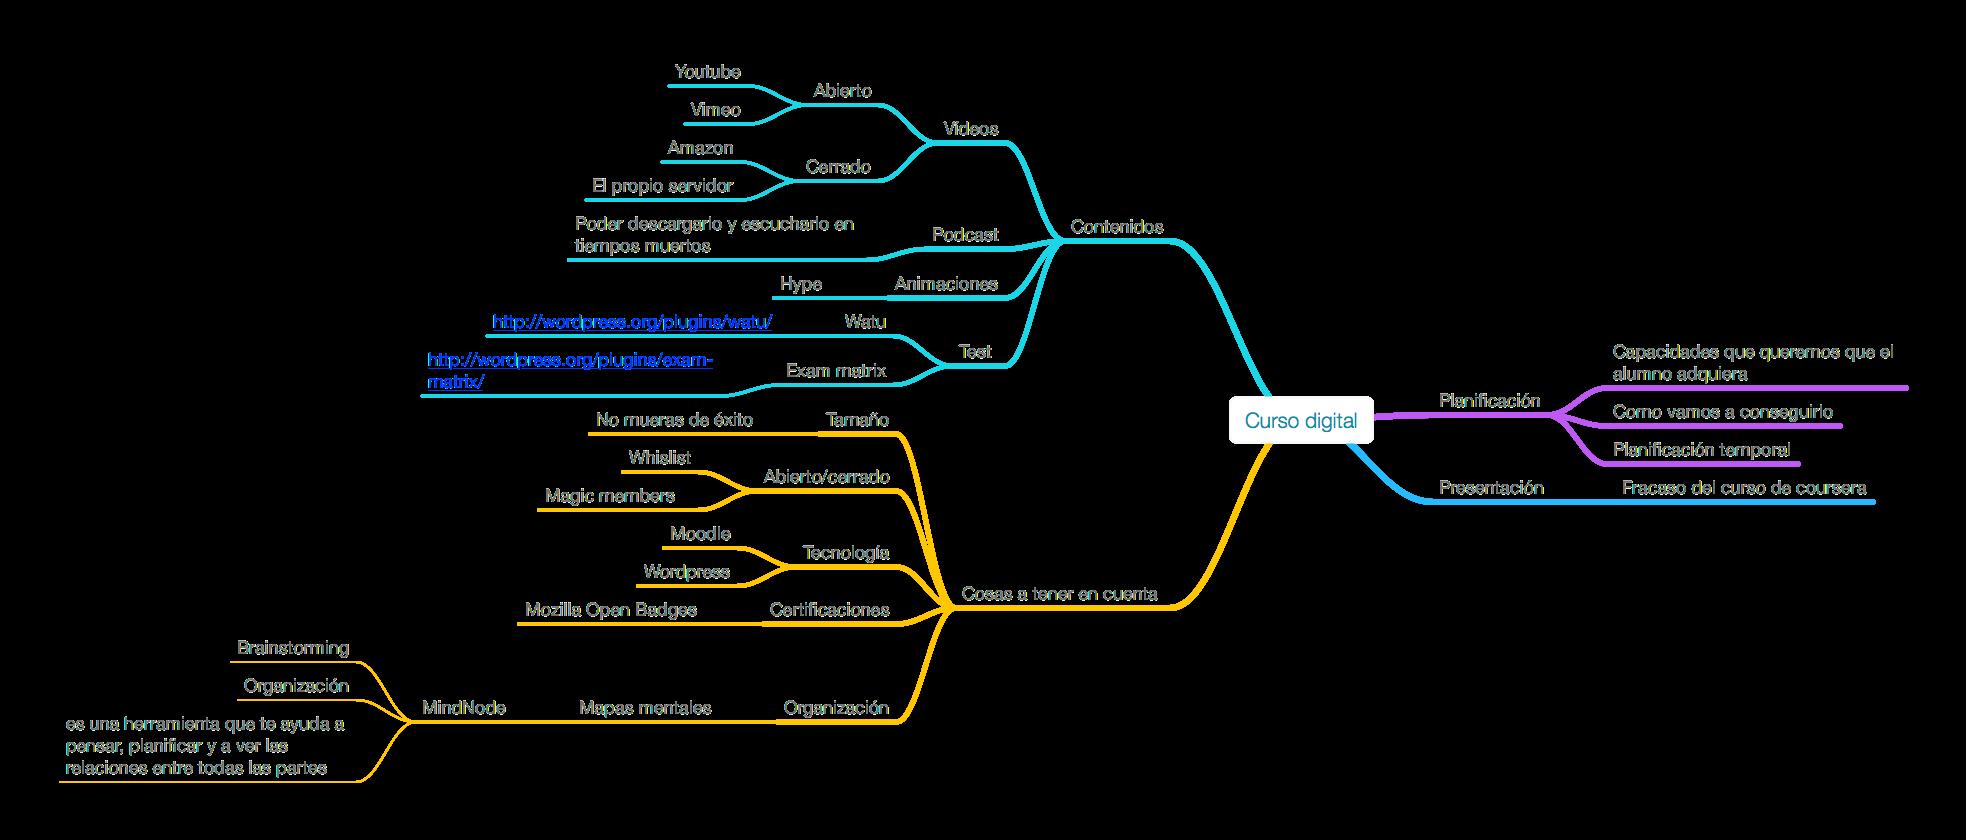 estructura curso digital